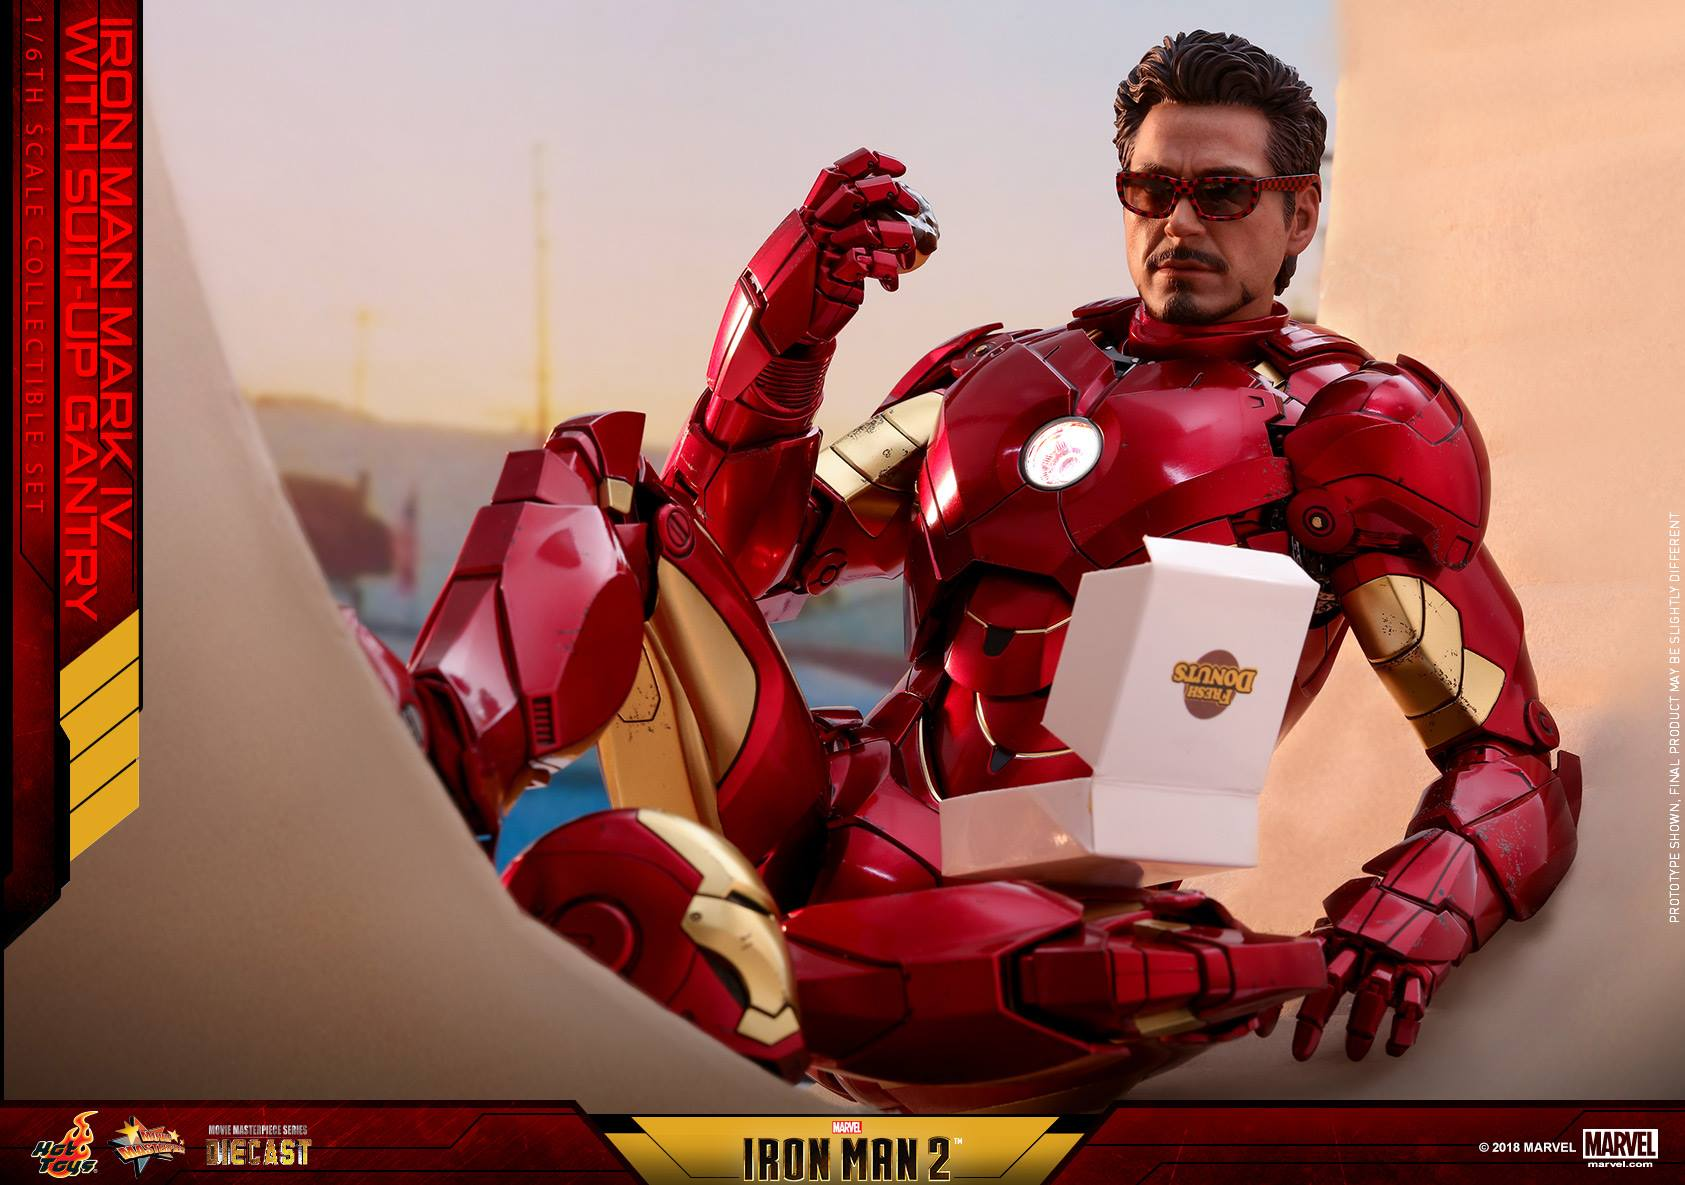 Hot-Toys-Iron-Man-MKIV-with-Gantry-015